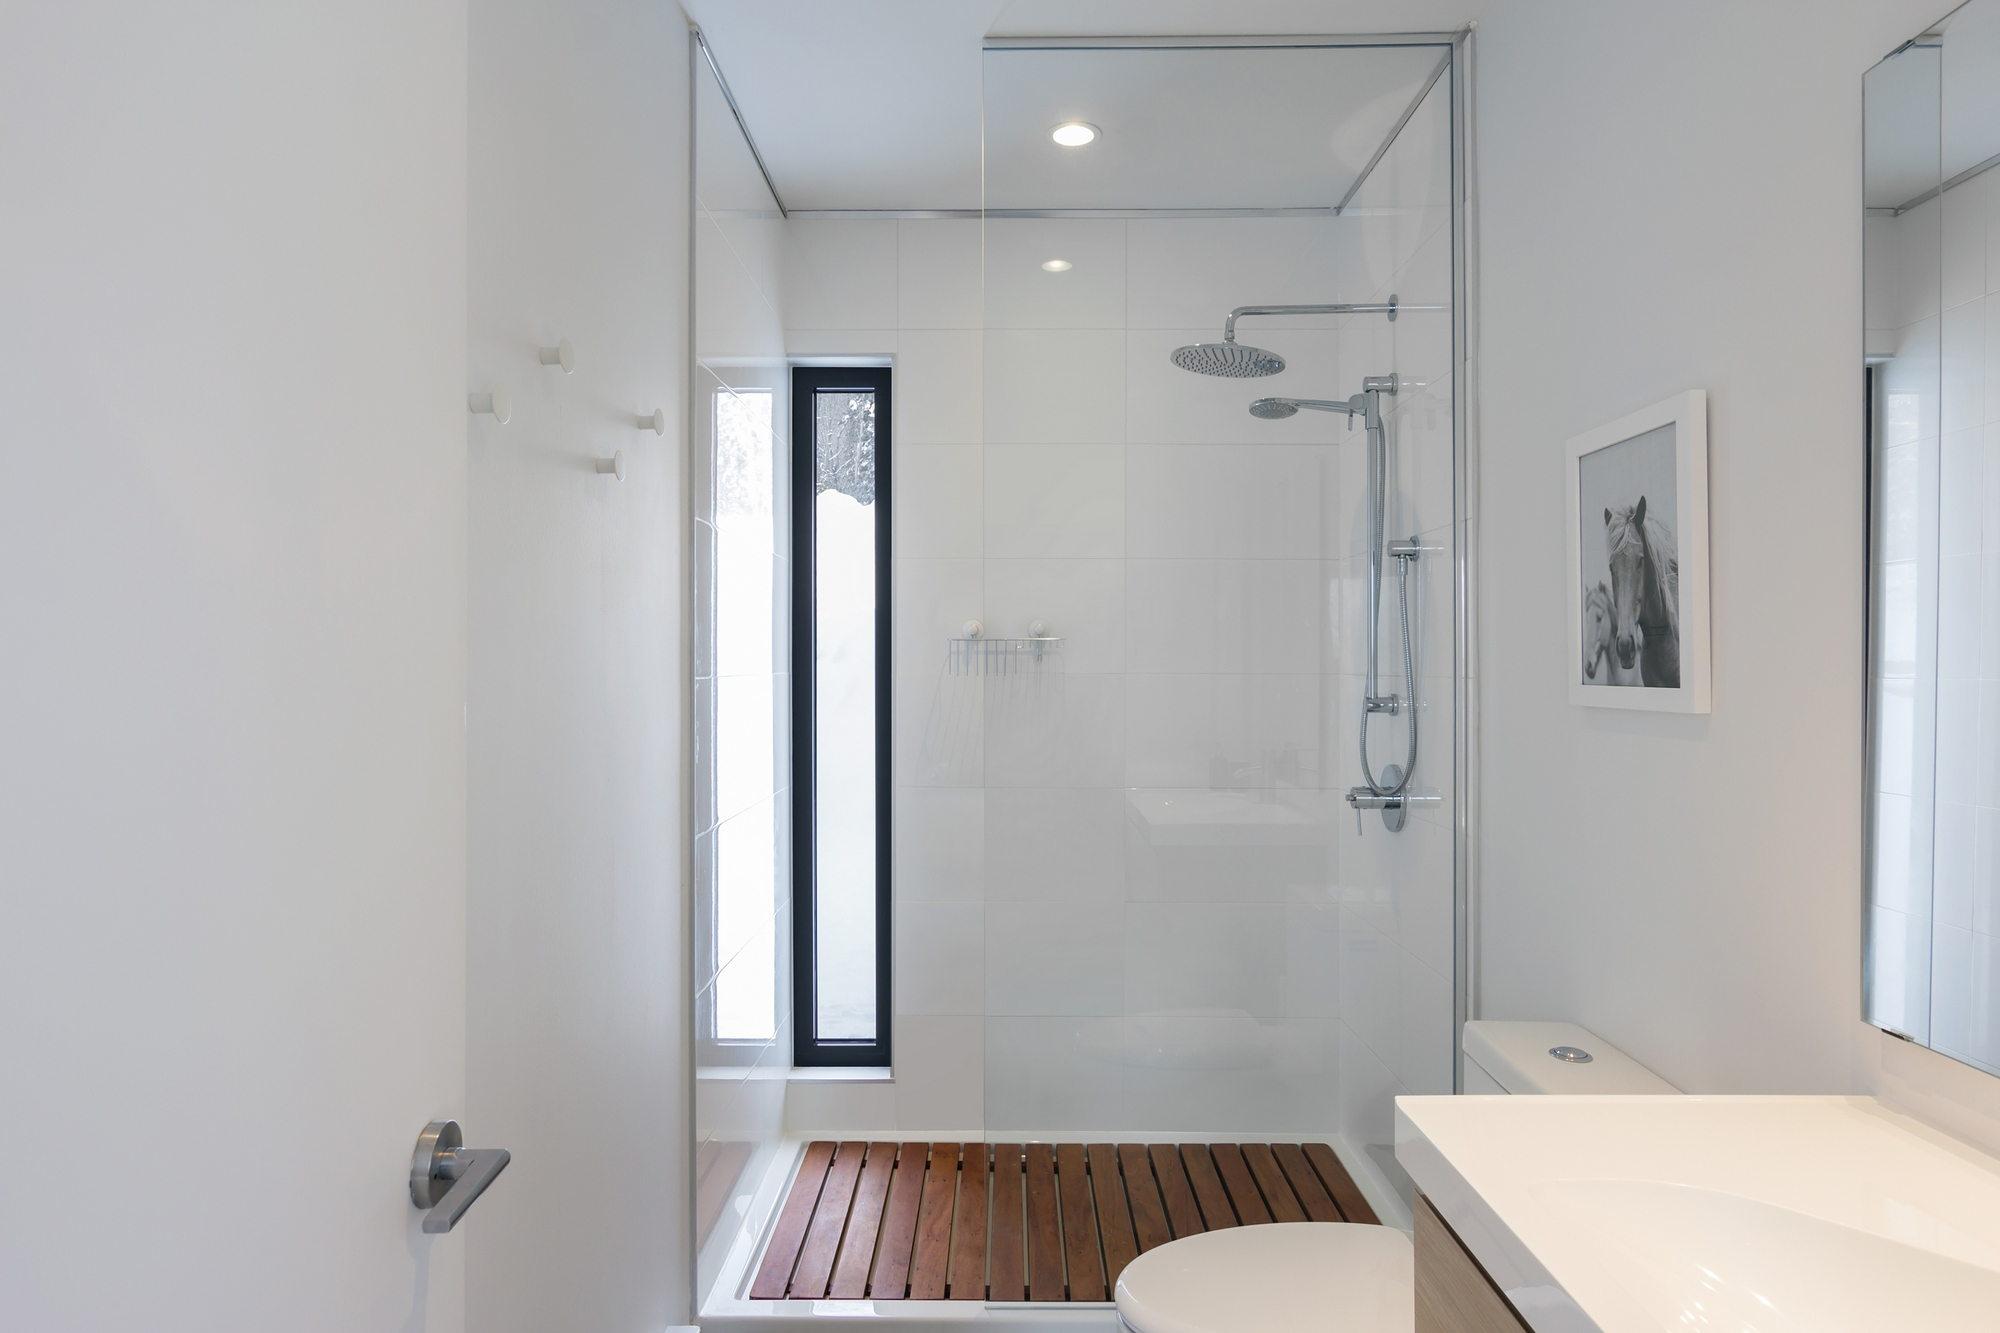 Scandinavian interior design bathroom awesome smart home design - Danish interior design ideas nordic simplicity ...